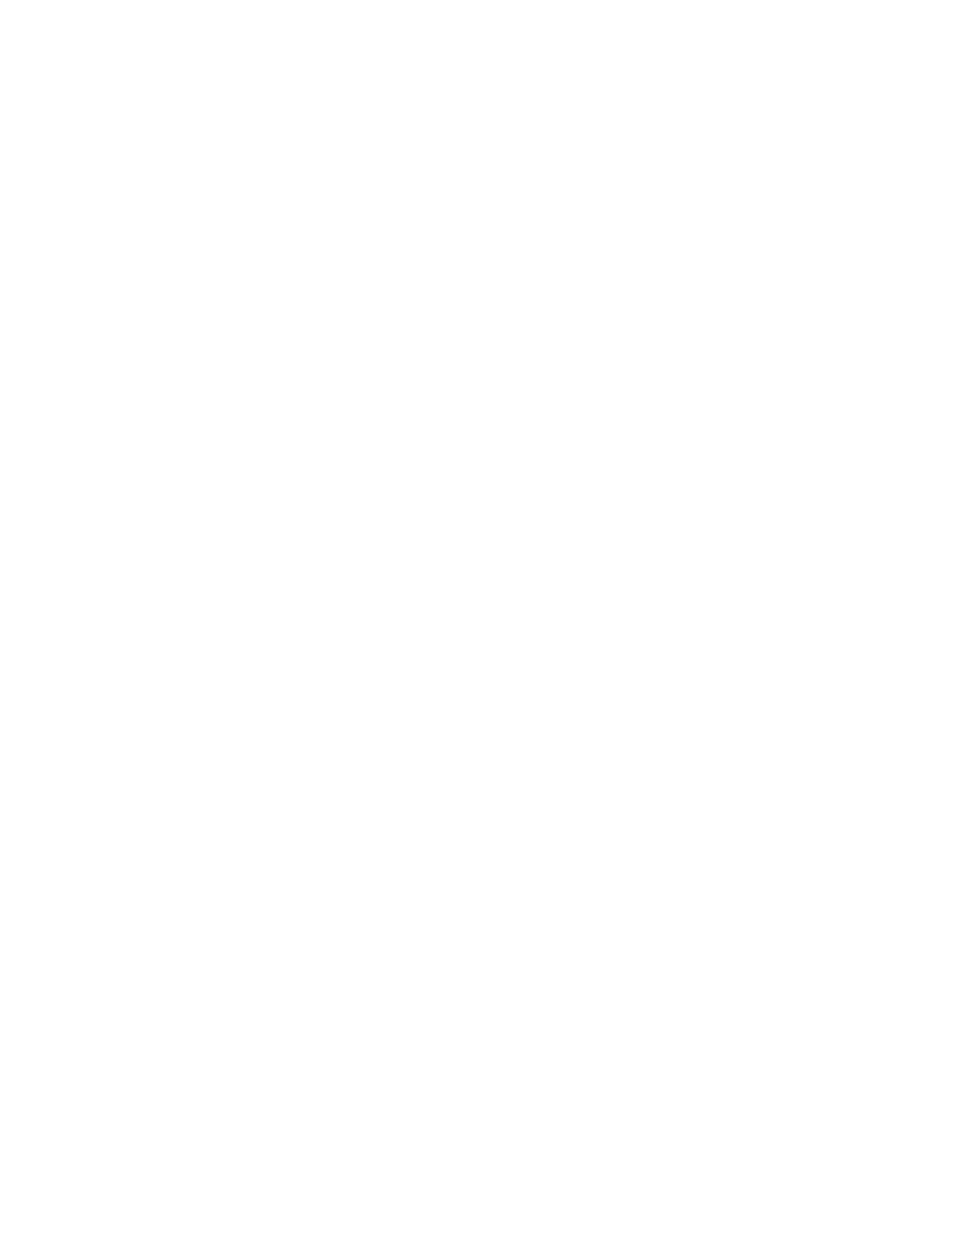 Vectronics Vec 102k User Manual Page 4 37 Superheterodyne Receiver Block Diagram